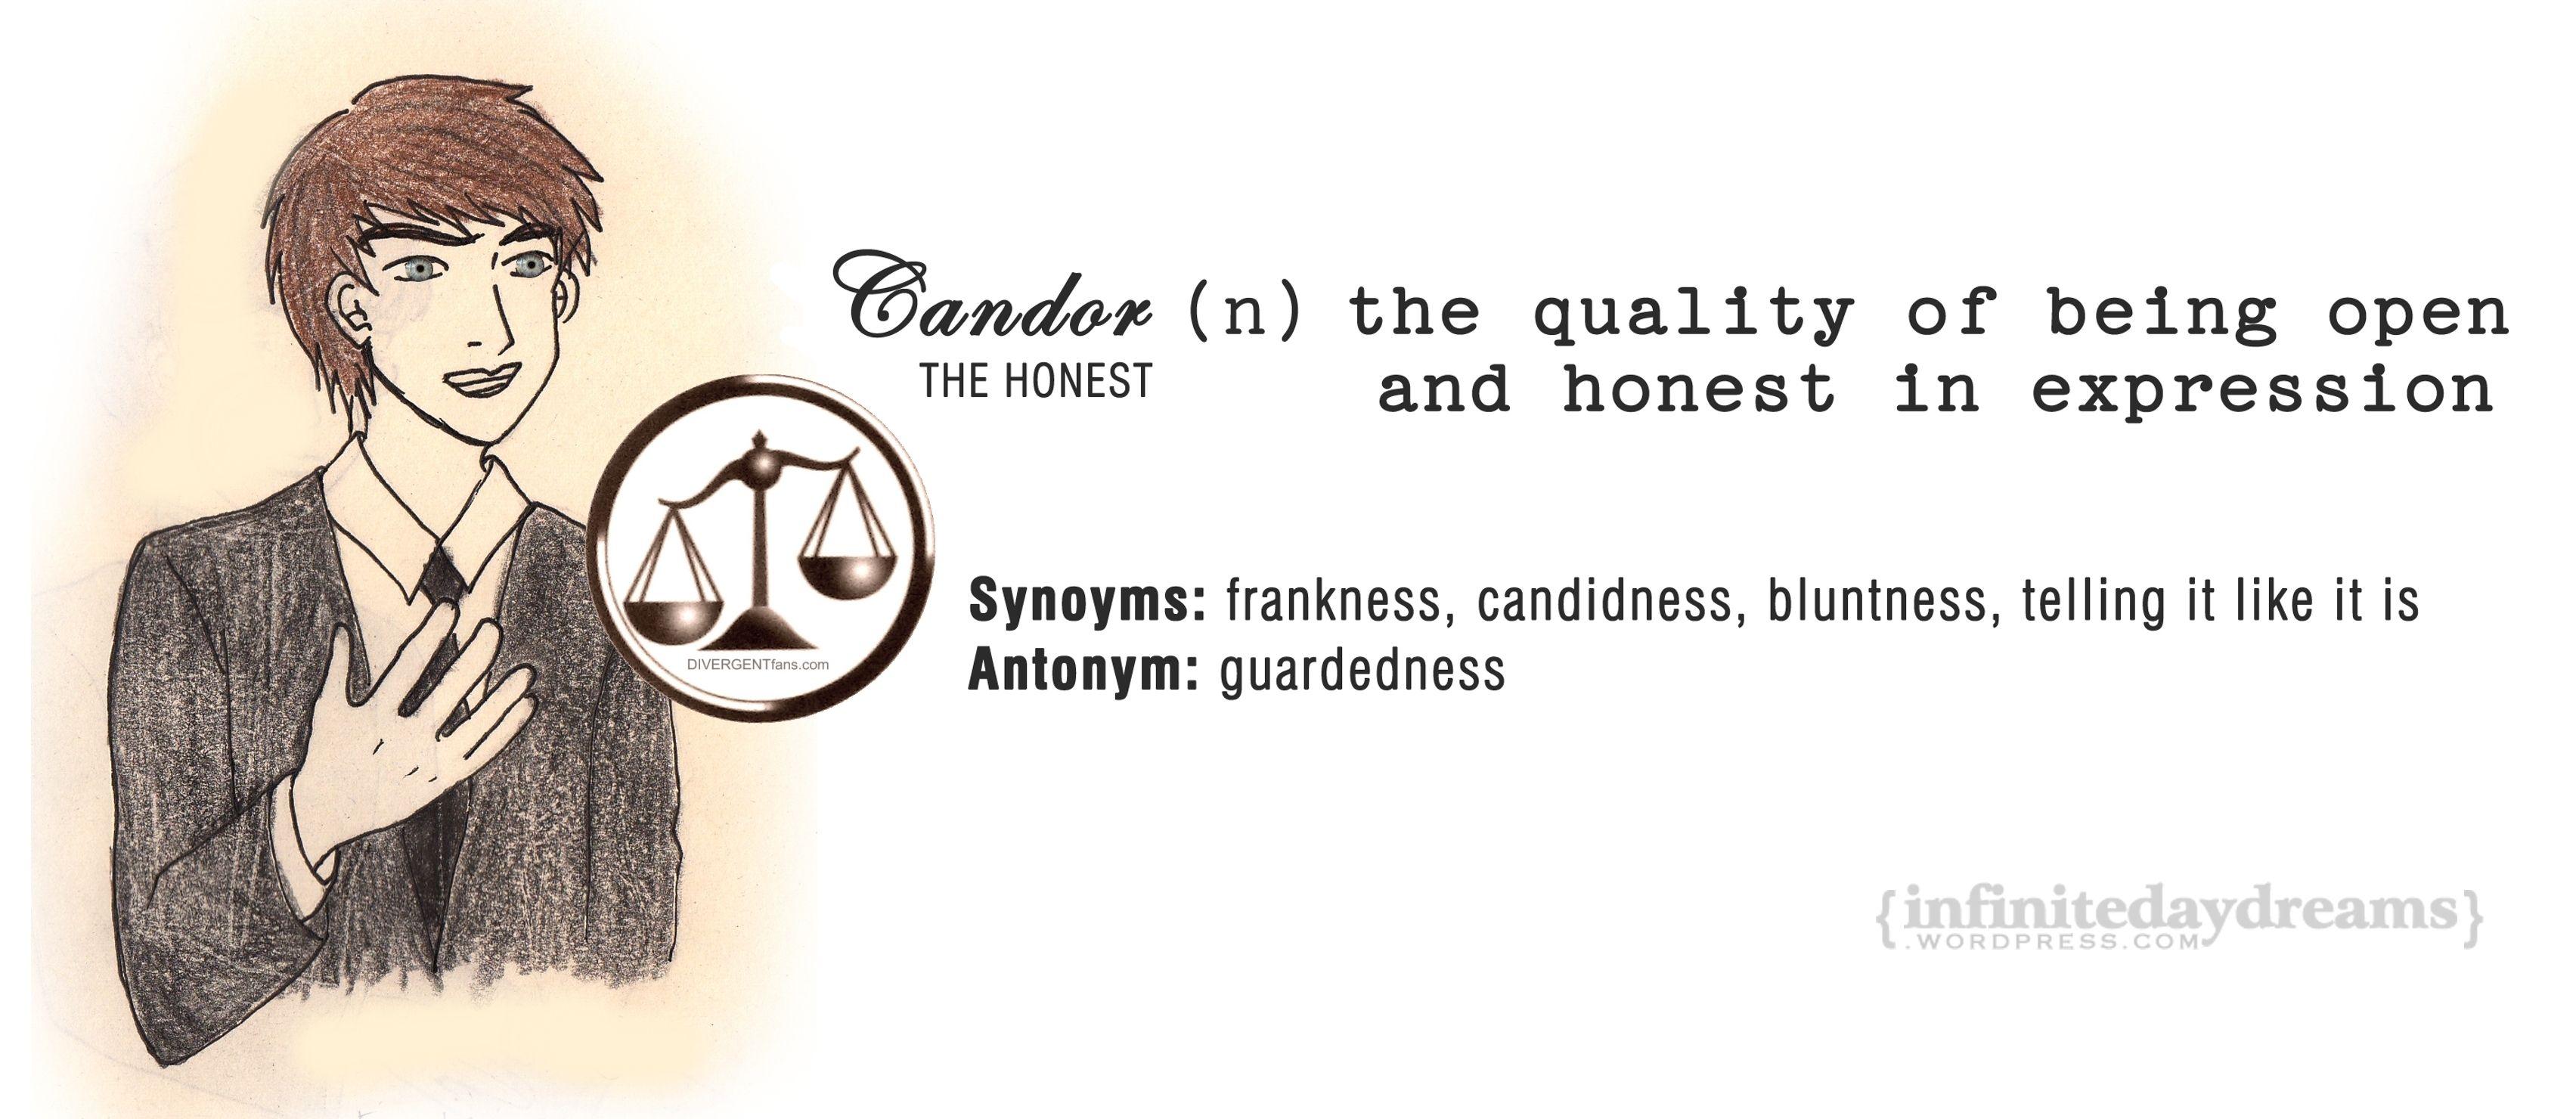 Candor Definition